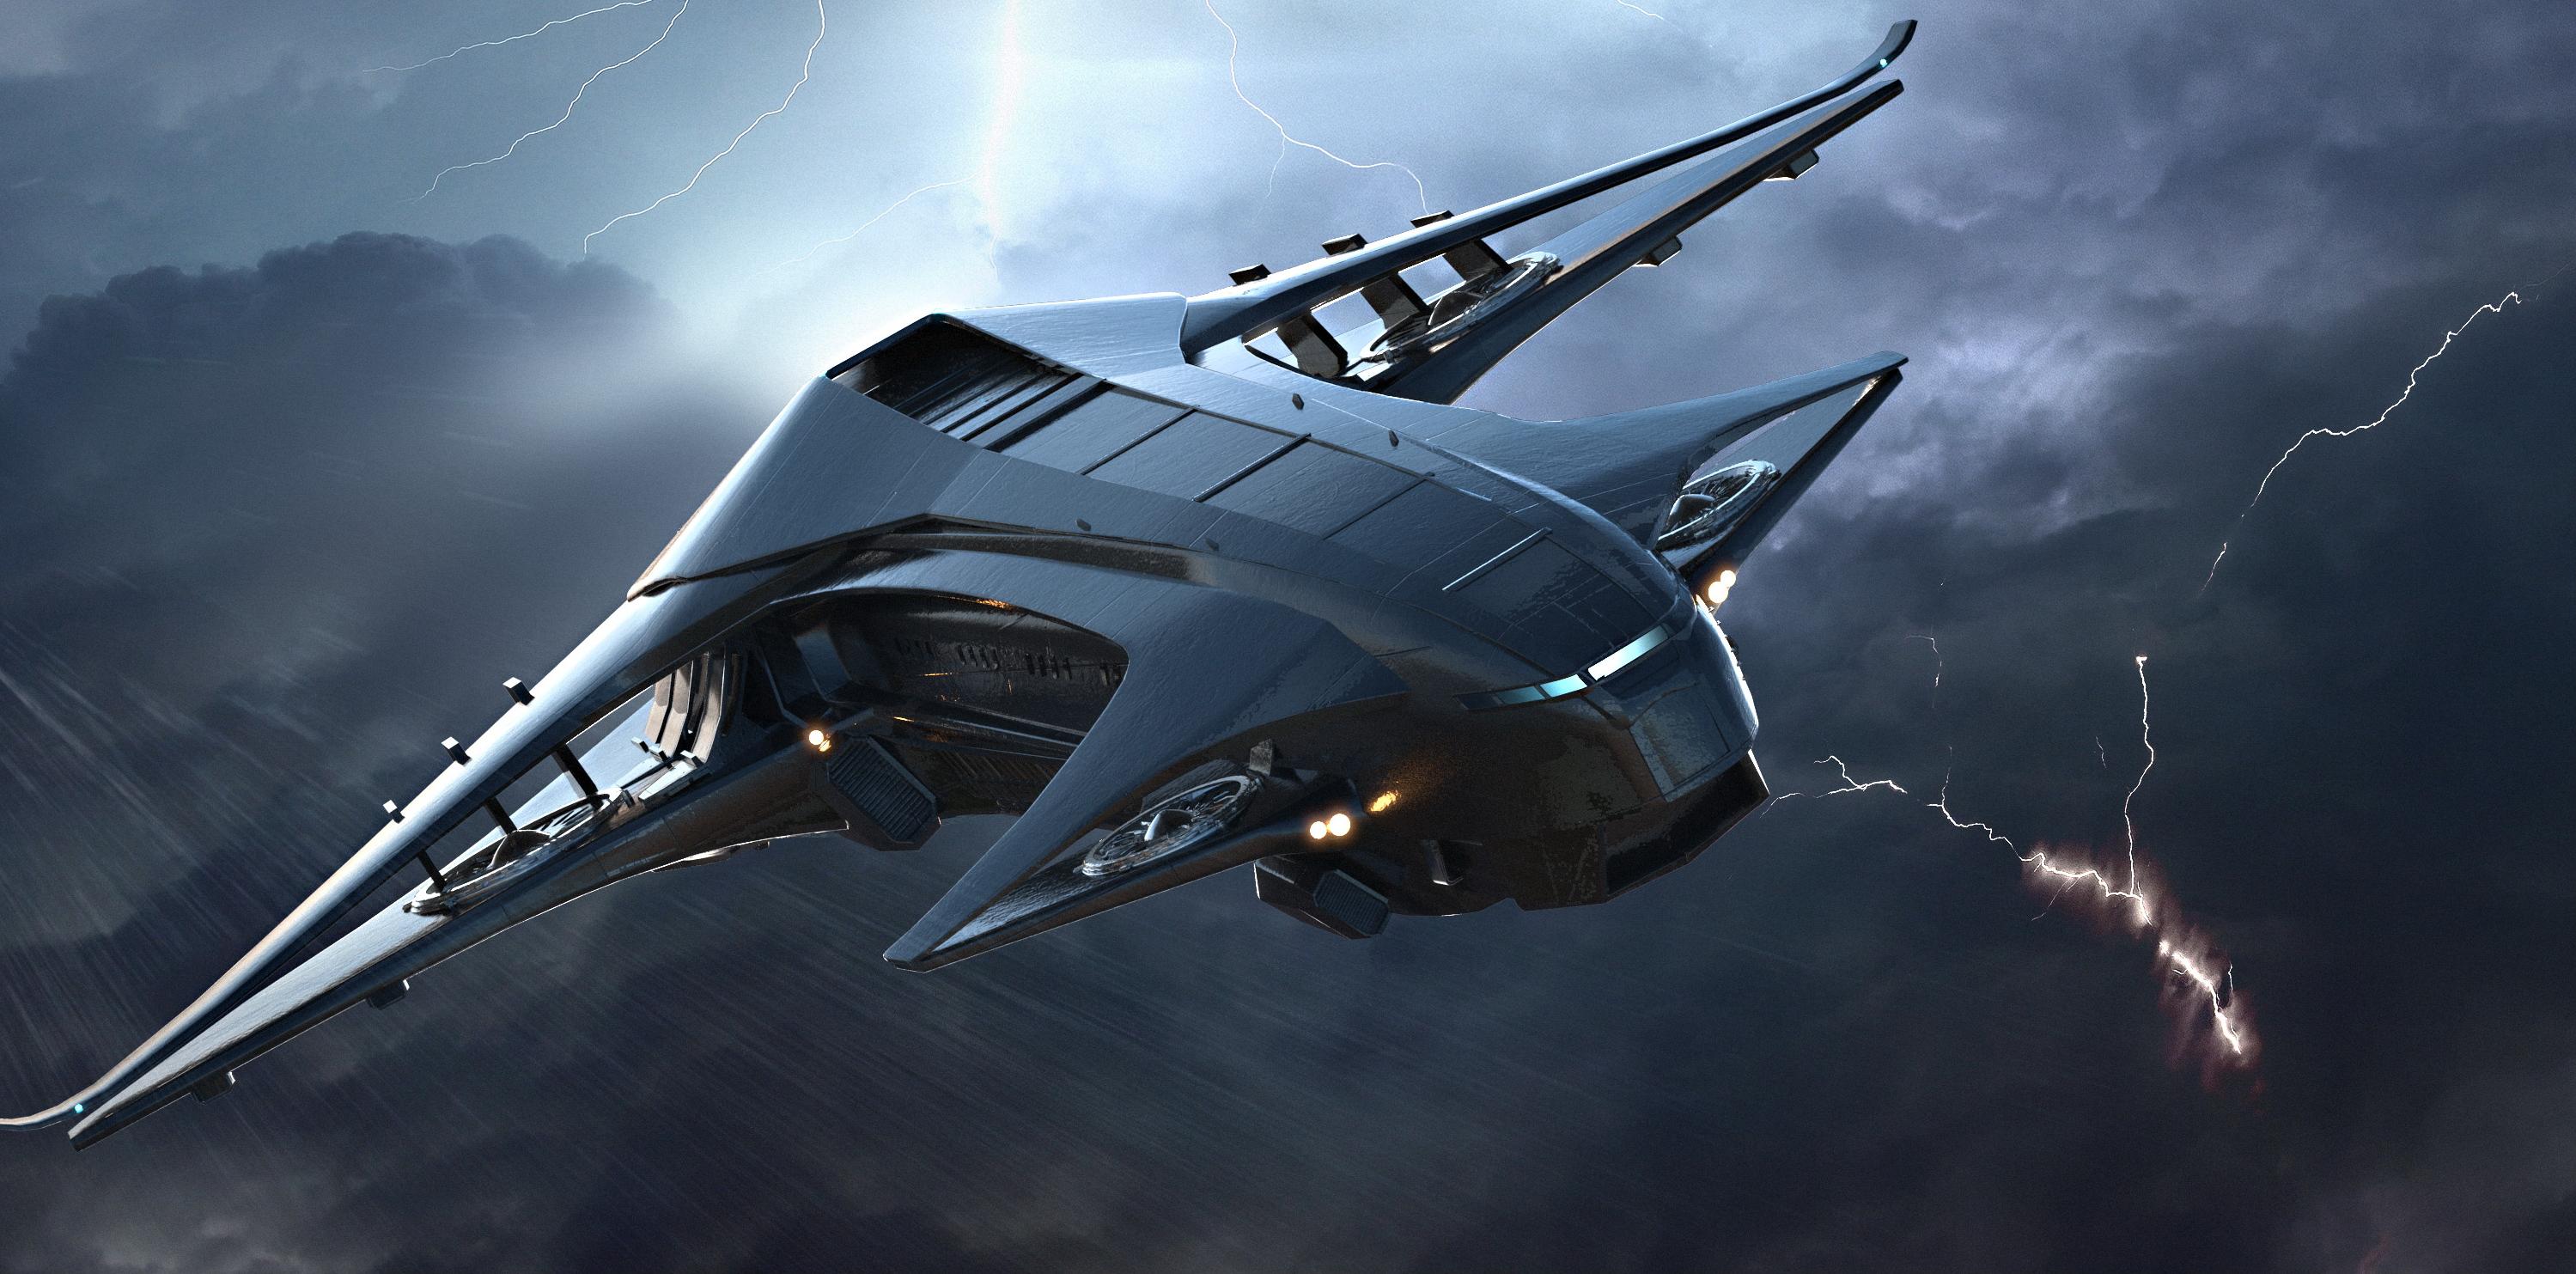 Star citizen space ship 2017 hd games 4k wallpapers - Spaceship wallpaper 4k ...